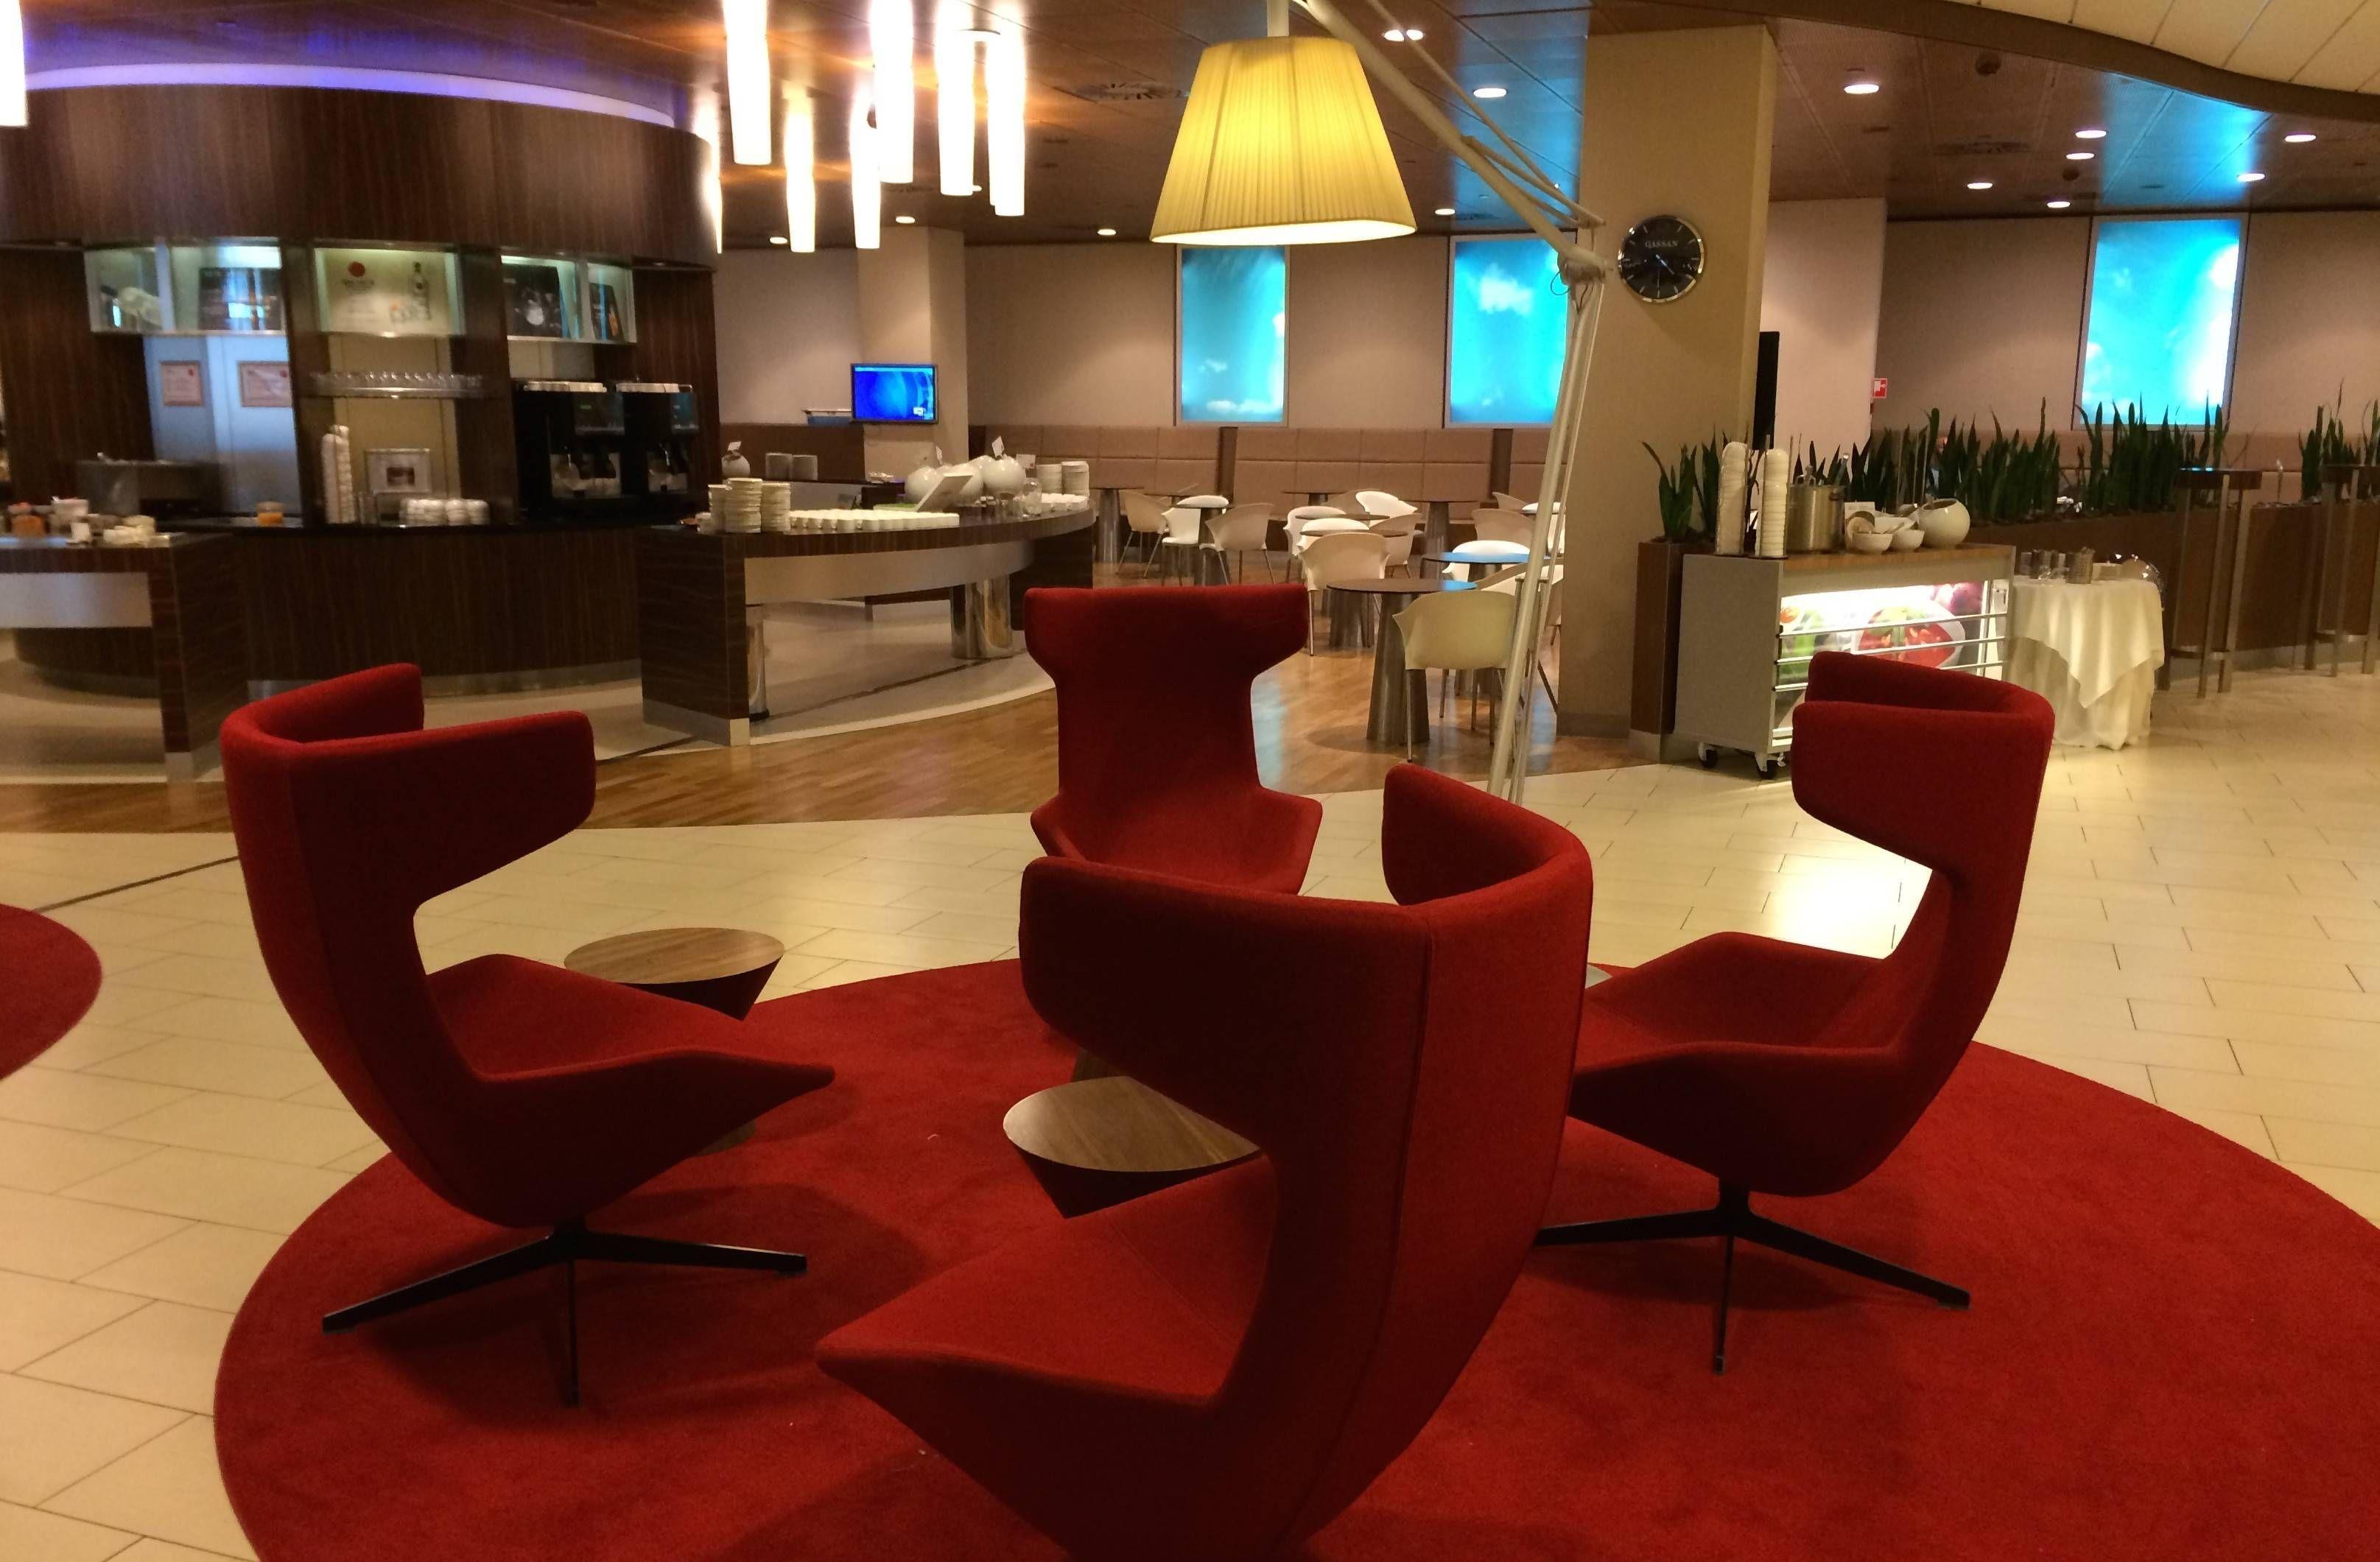 Sala VIP KLM Crown Lounge – Aeroporto de Amsterdam (AMS)